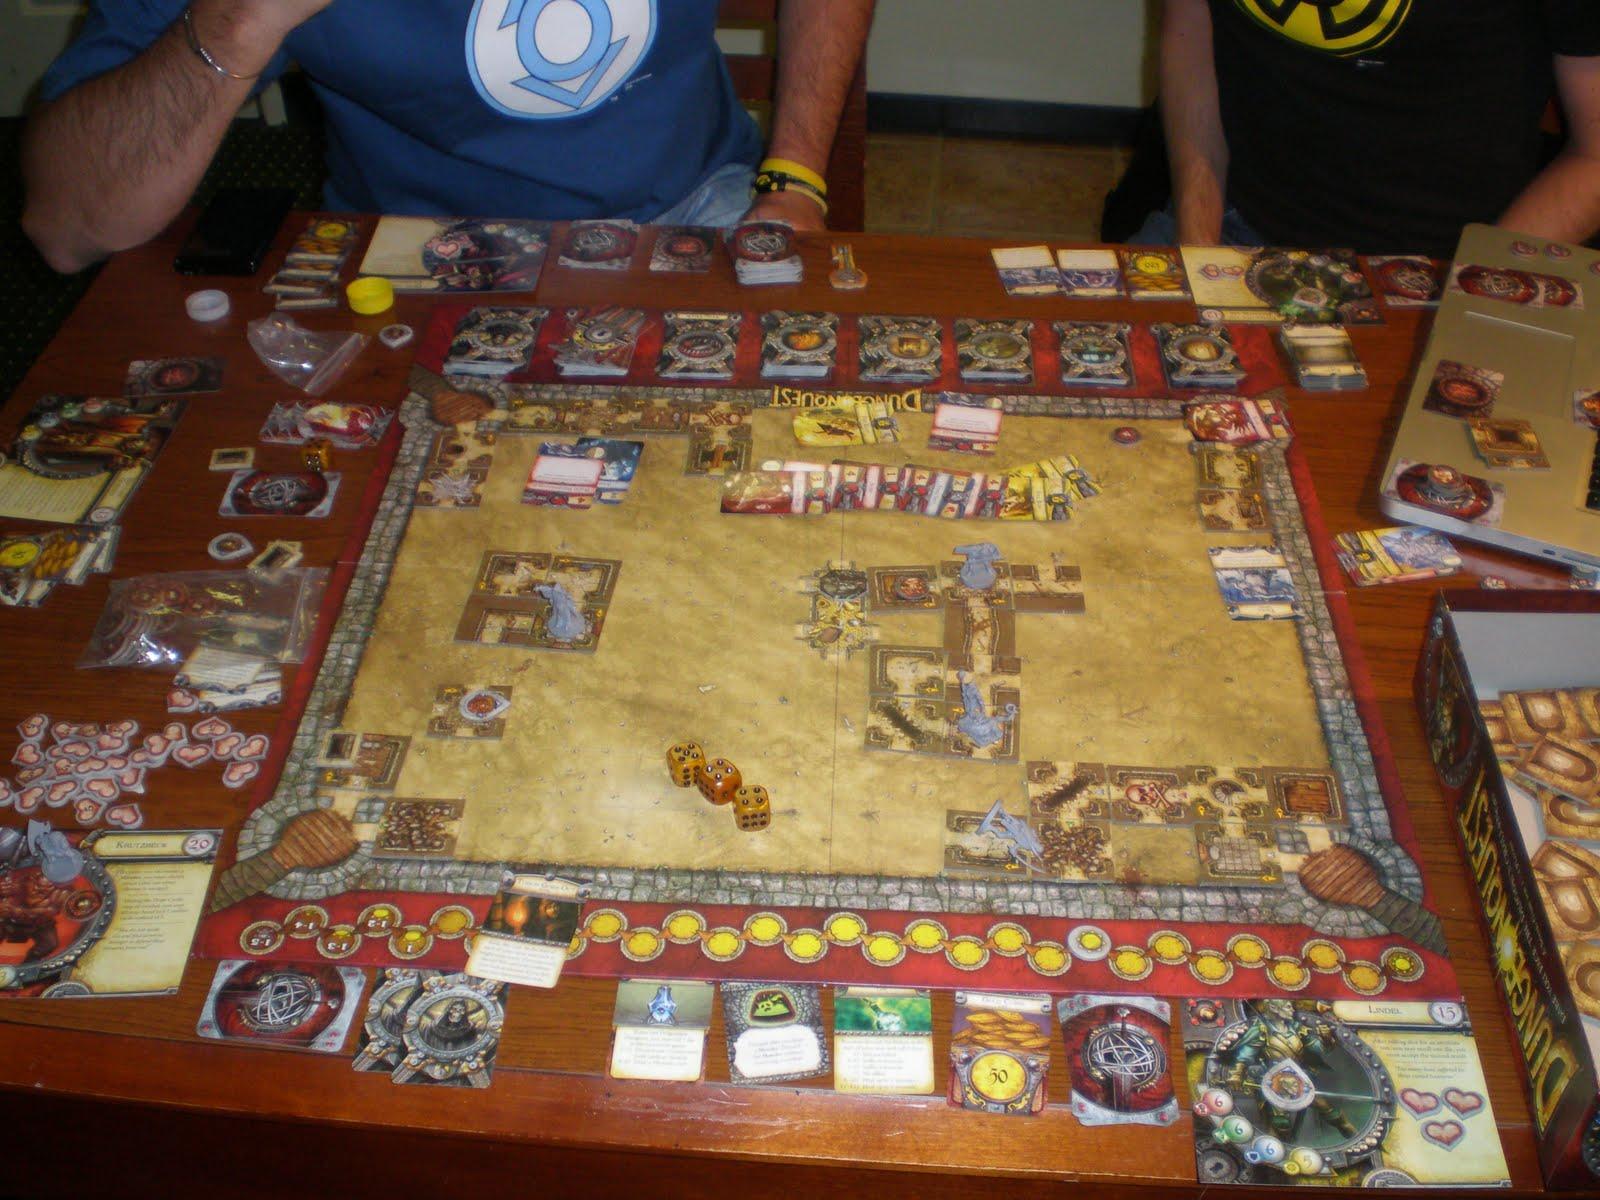 Inside terrinoth dungeonquest isola illyon - Dungeon gioco da tavolo ...